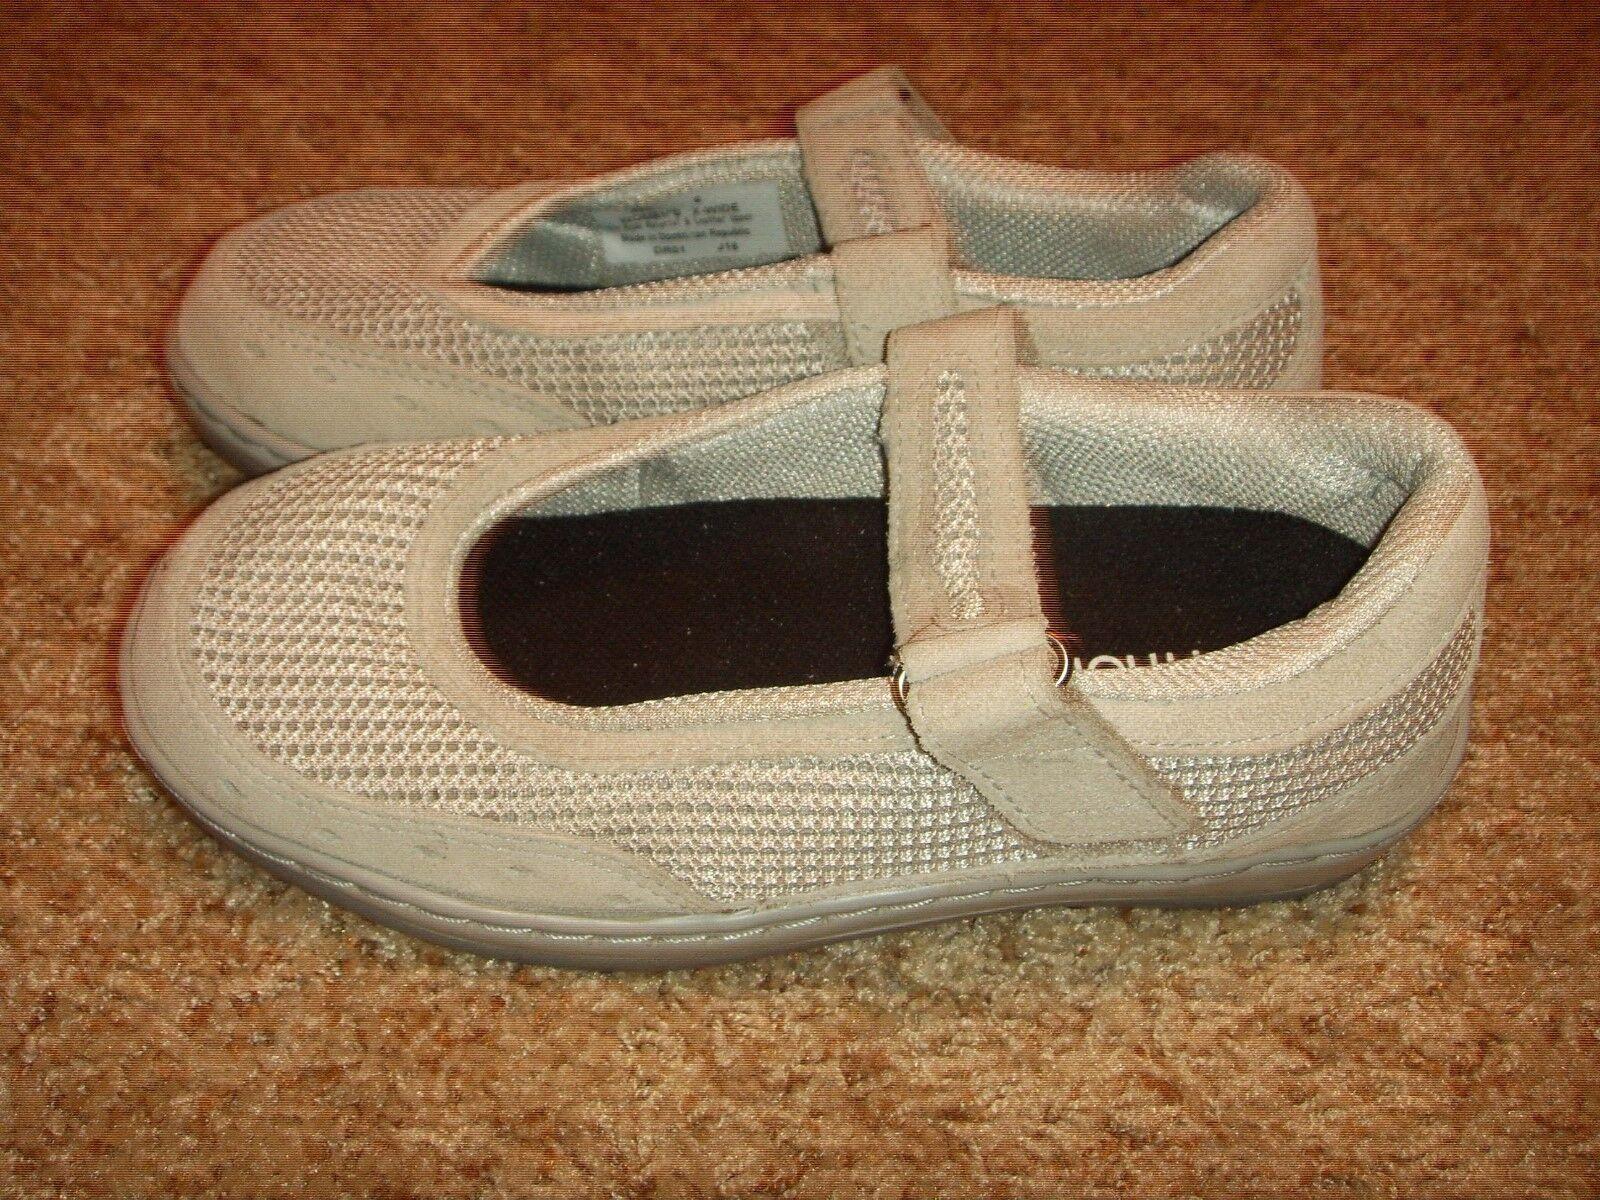 Orthofeet 853 Comfort Diabetic Therapeutic Extra Depth Schuhe Damenschuhe Größe 6EW